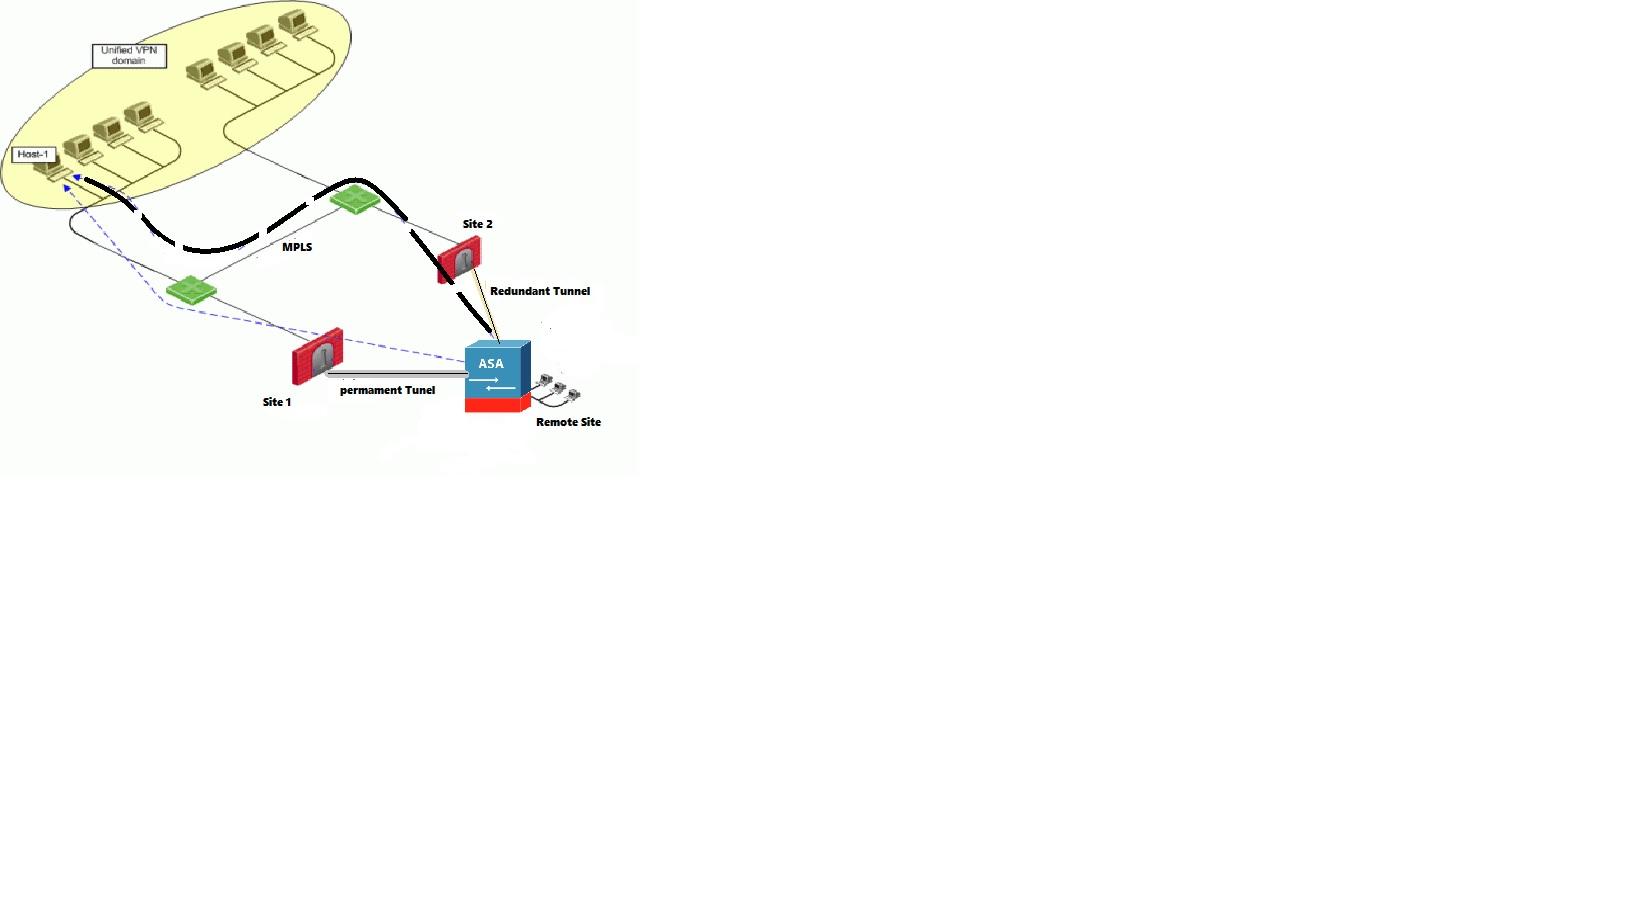 Madison : Redundant vpn tunnels cisco asa